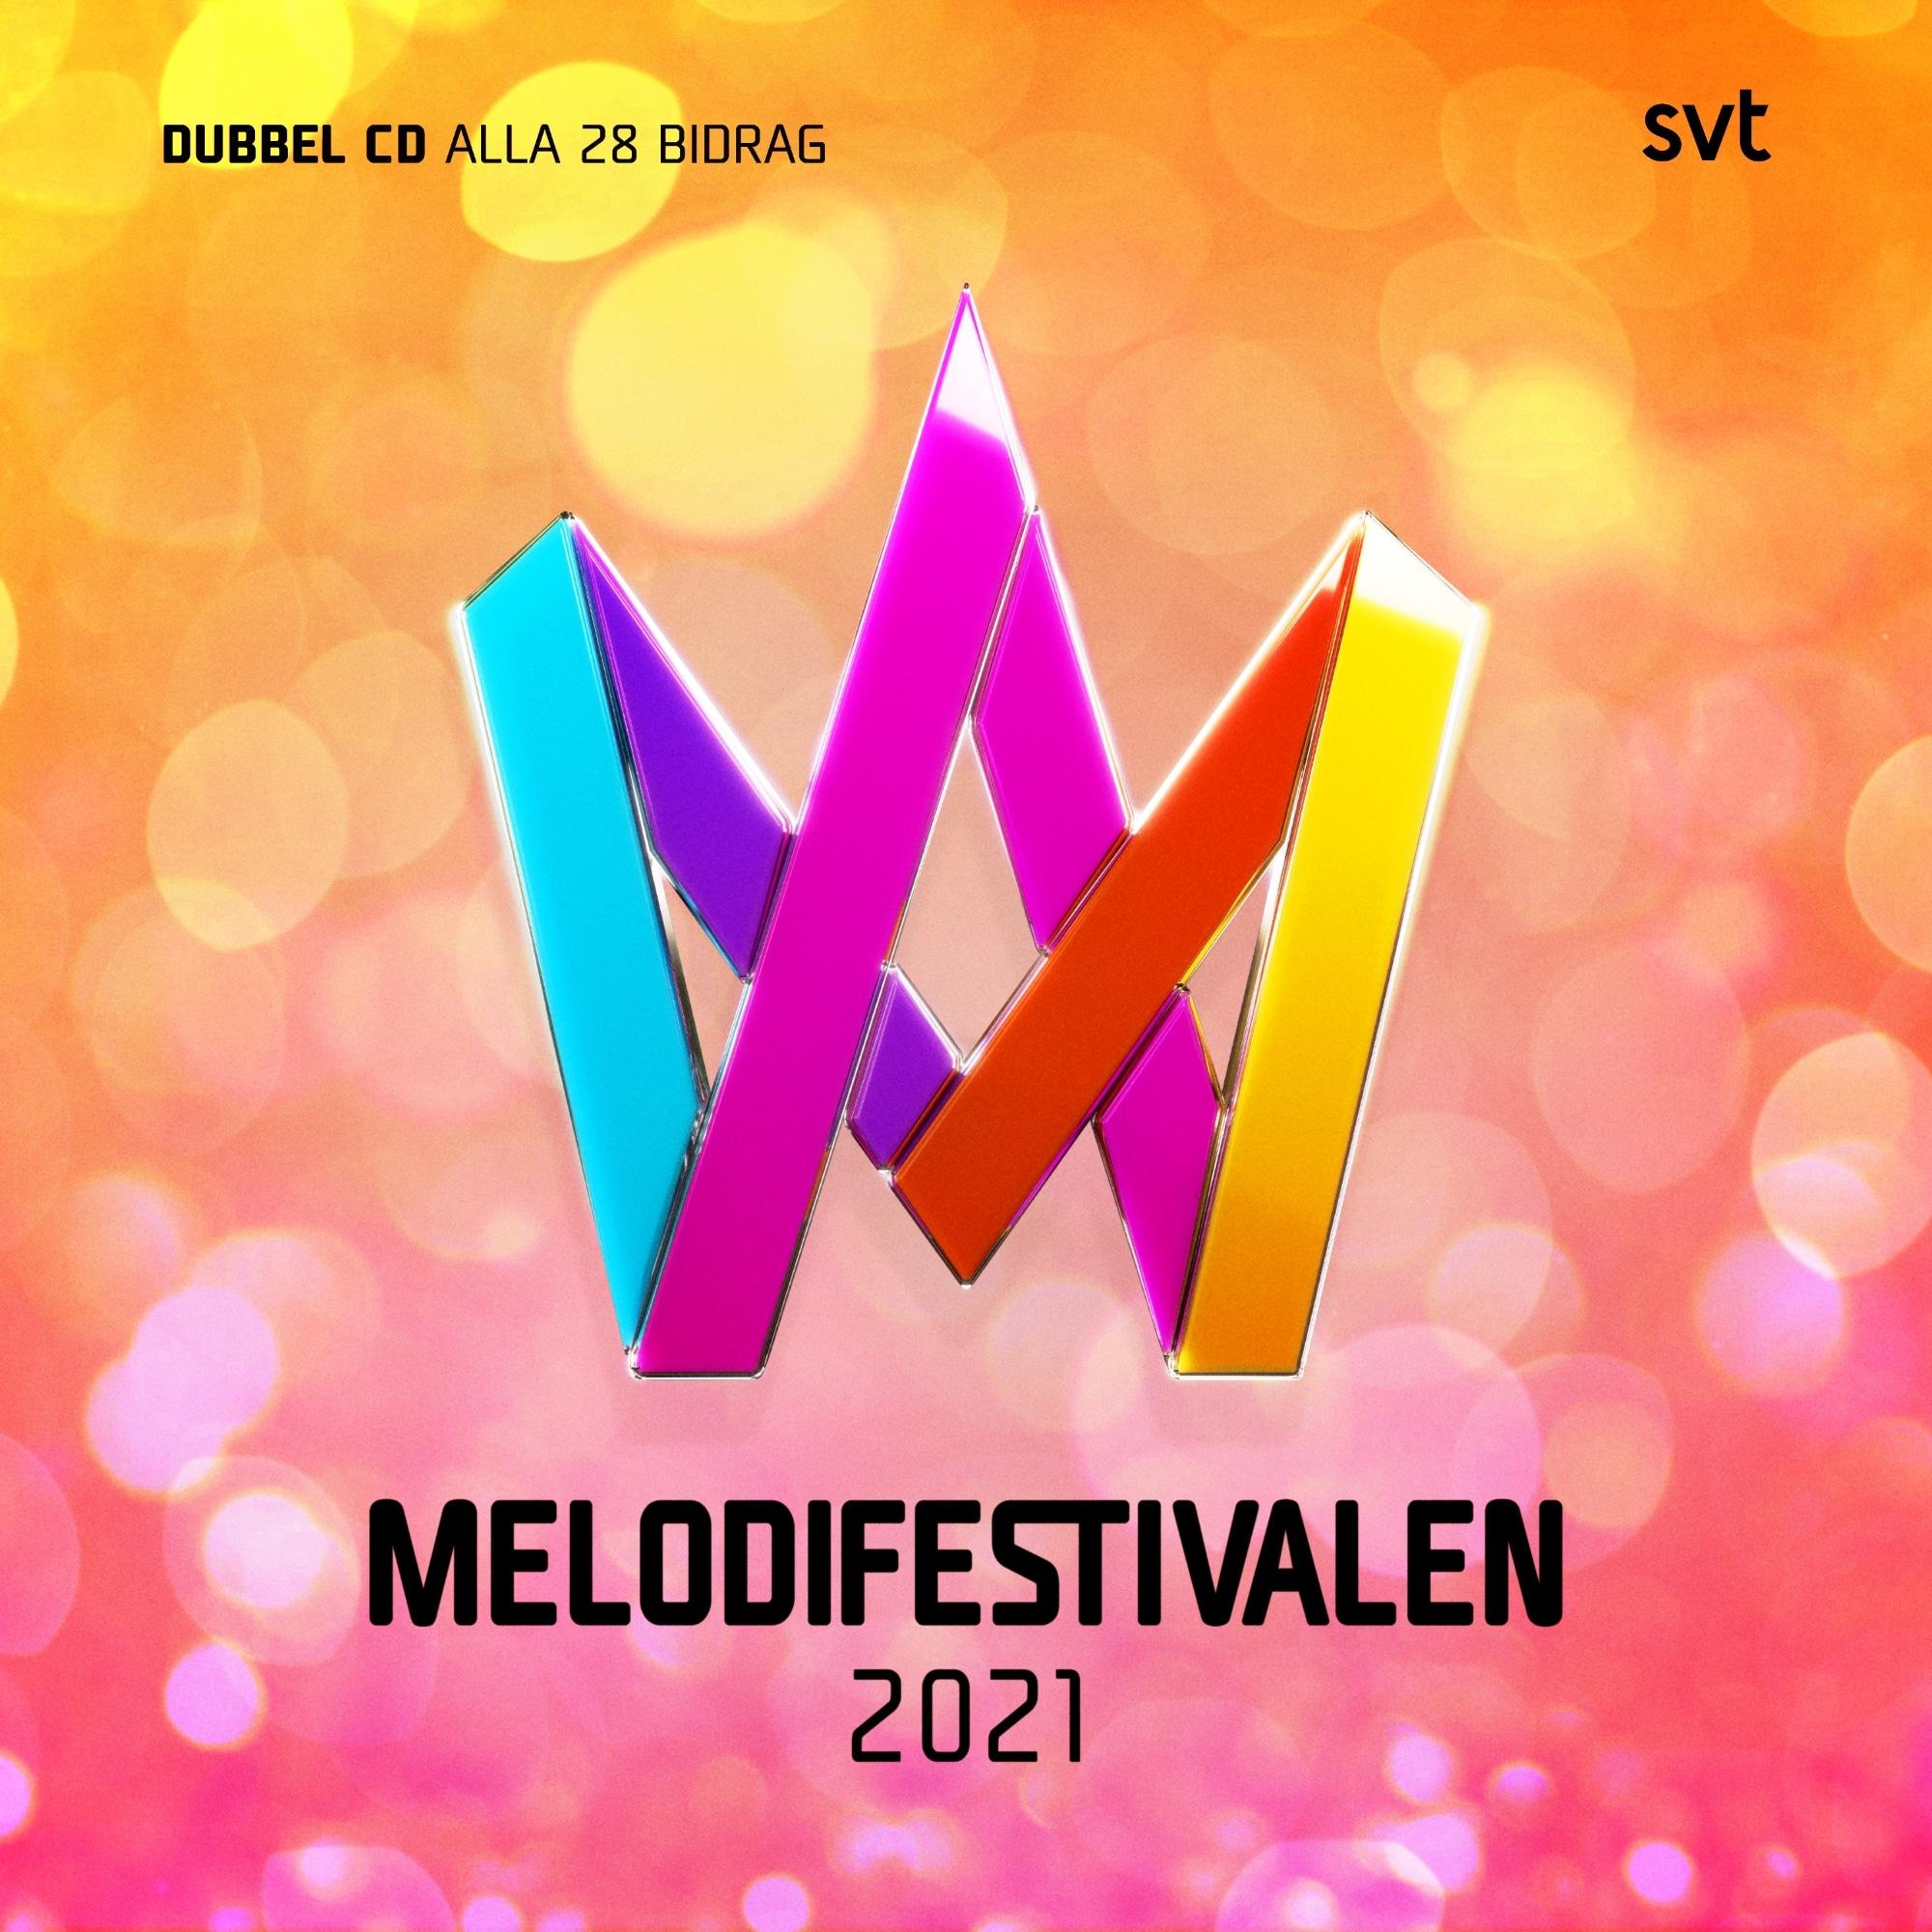 VA - Melodifestivalen 2021 (2021) [FLAC] Download